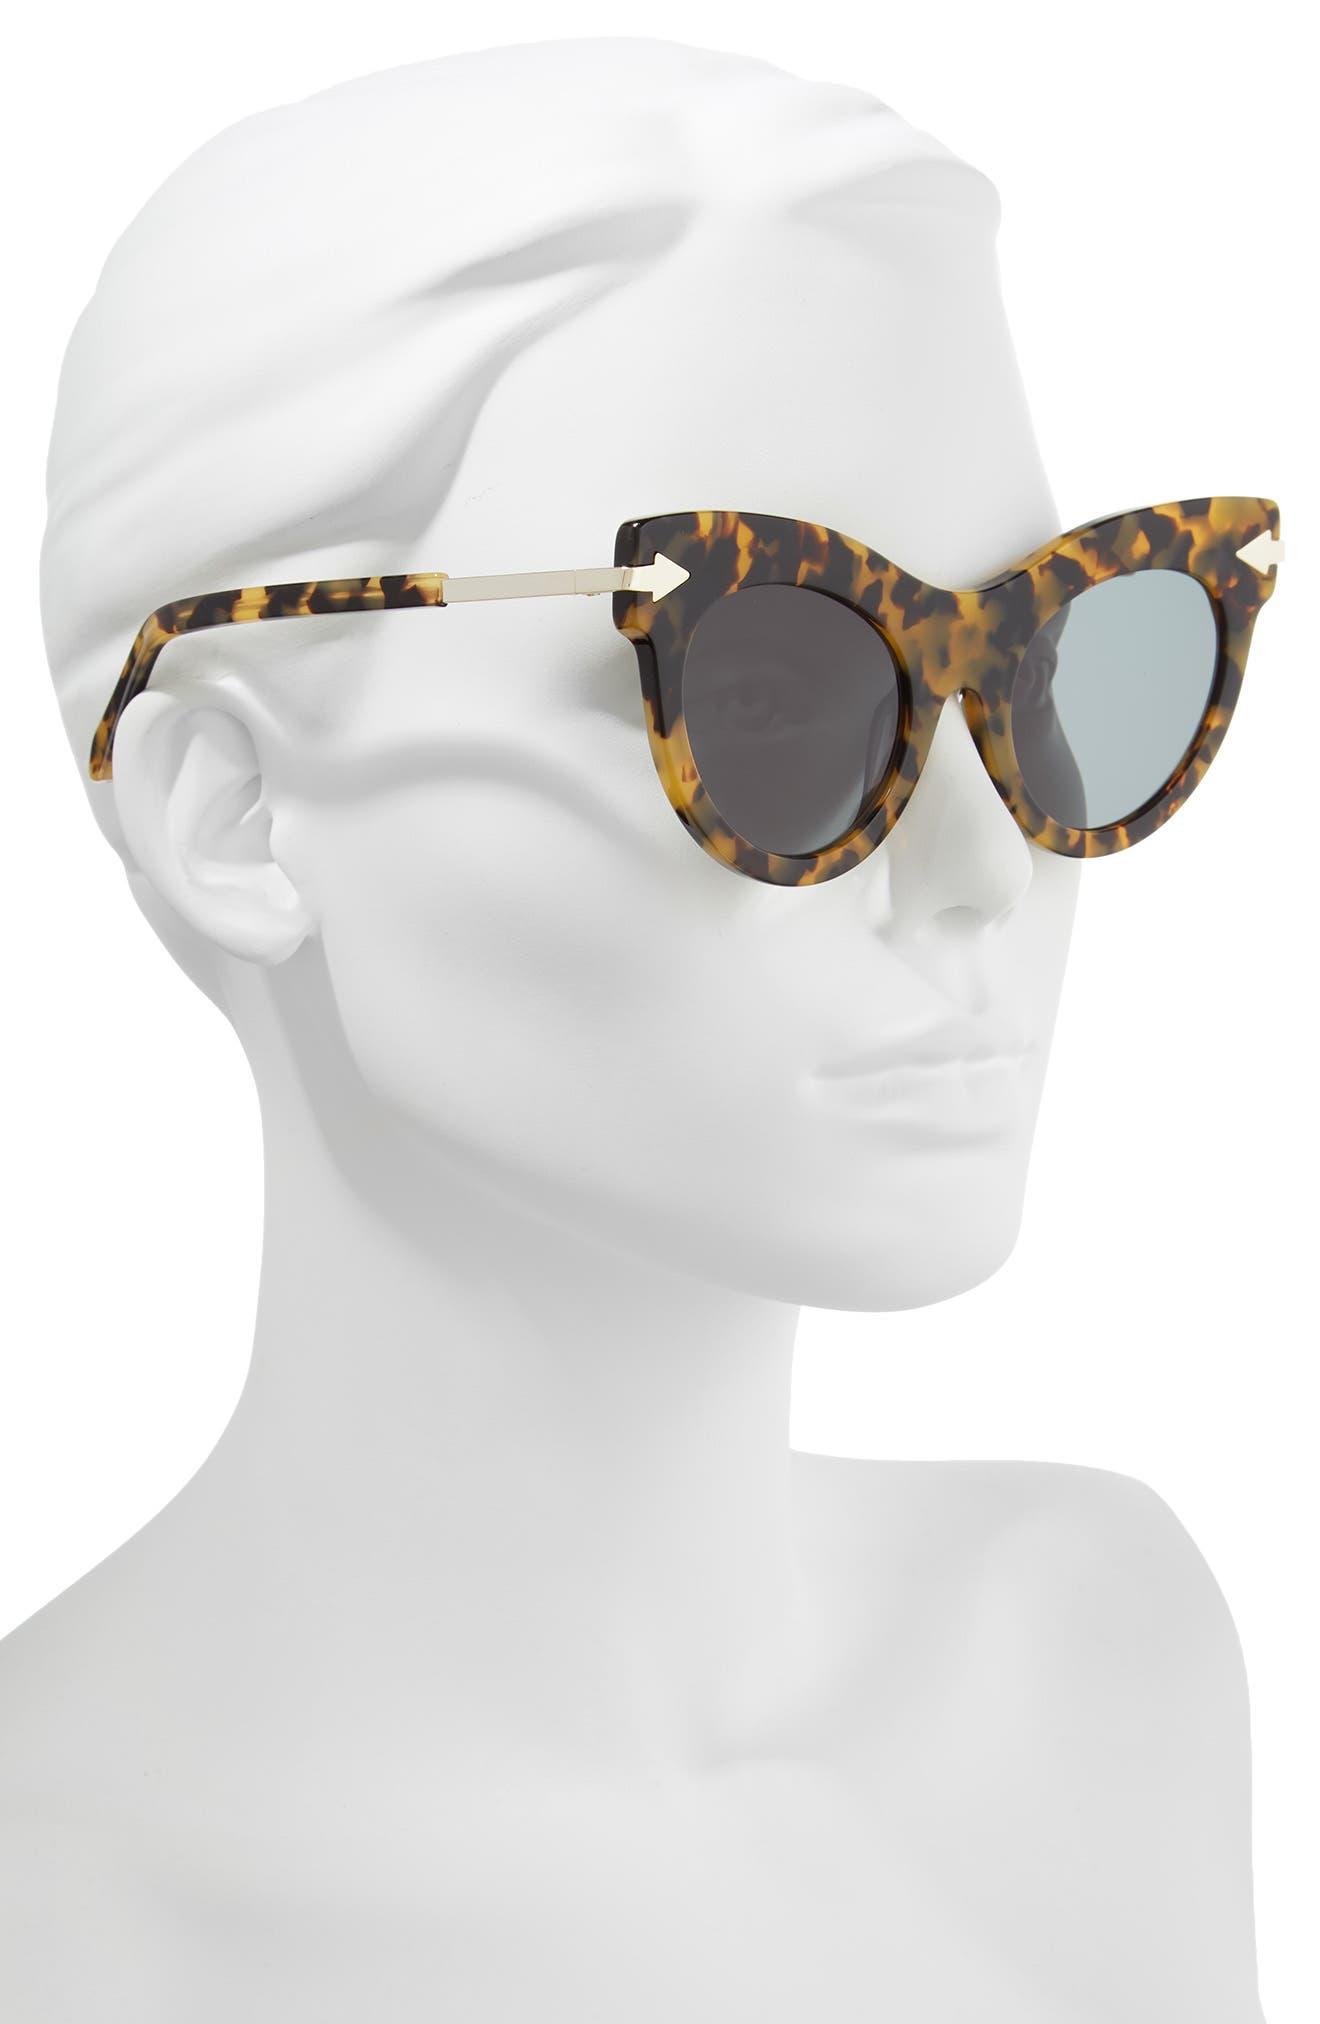 c9548d1c837 Women s KAREN WALKER Cat-Eye Sunglasses